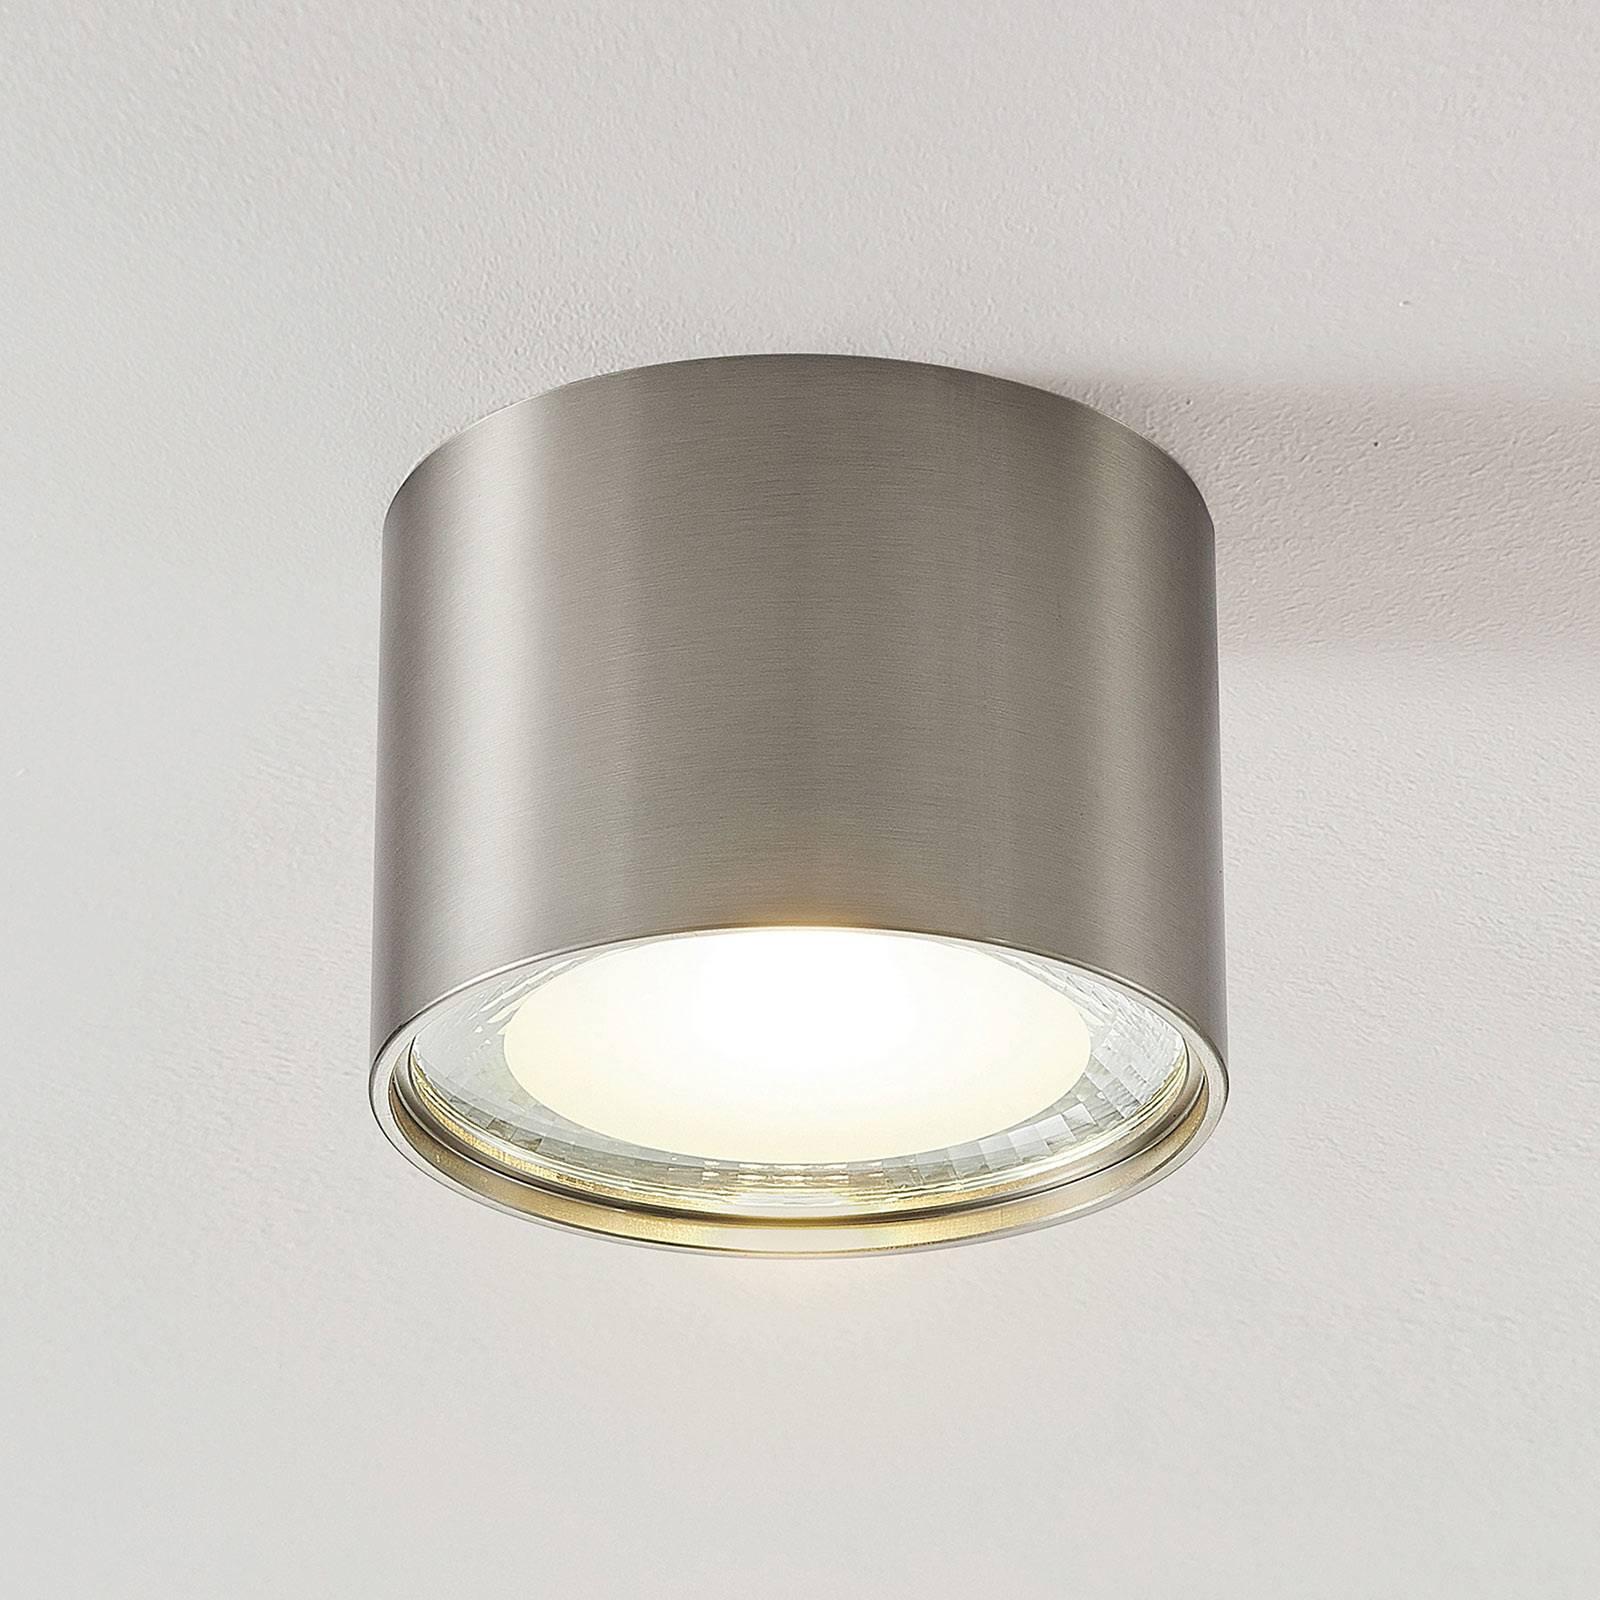 LED downlight Meera, rond, gesatineerd nikkel